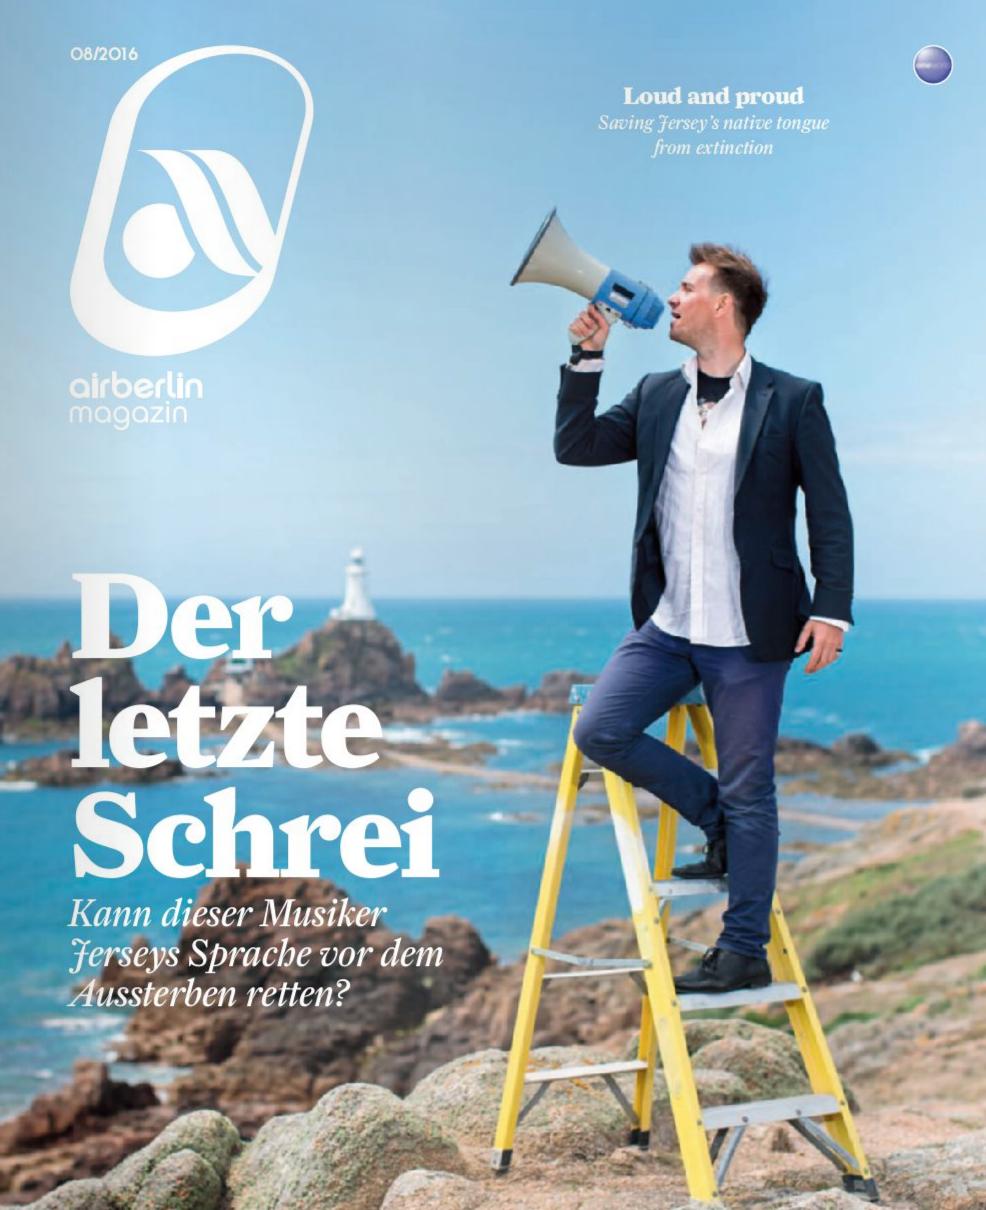 Airberlin Magazin,  August 2016   Translation